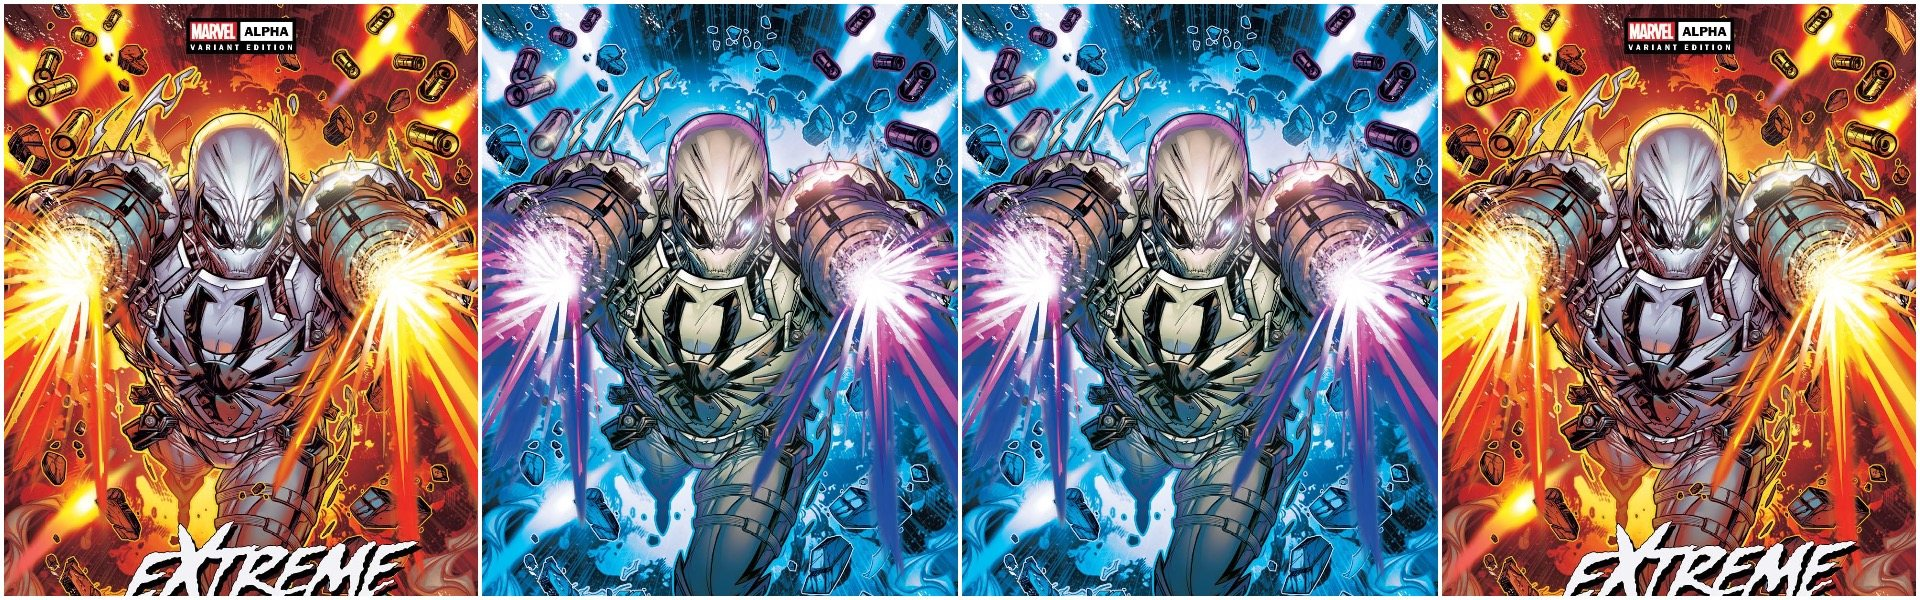 Extreme Carnage Alpha #1 Jonboy Meyers Exclusives